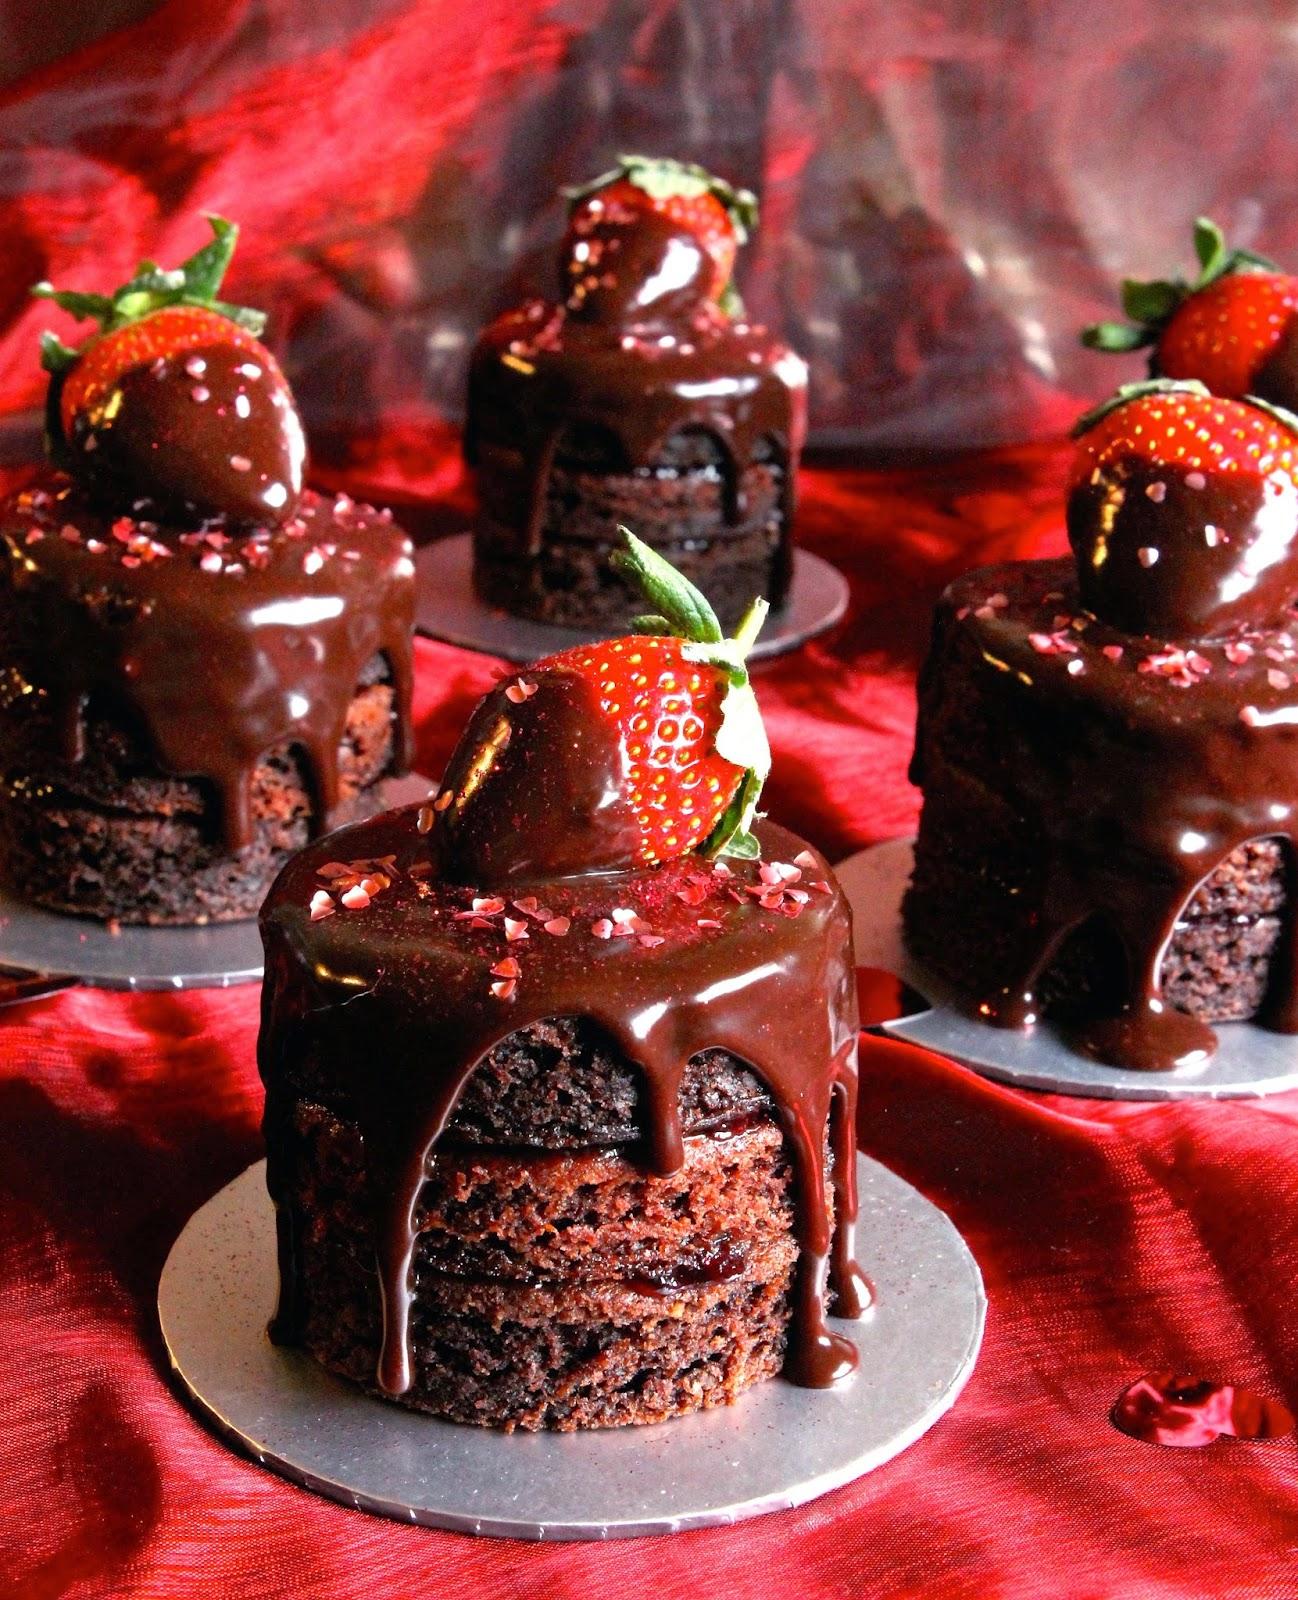 Cakes Chocolates Dark Temptations